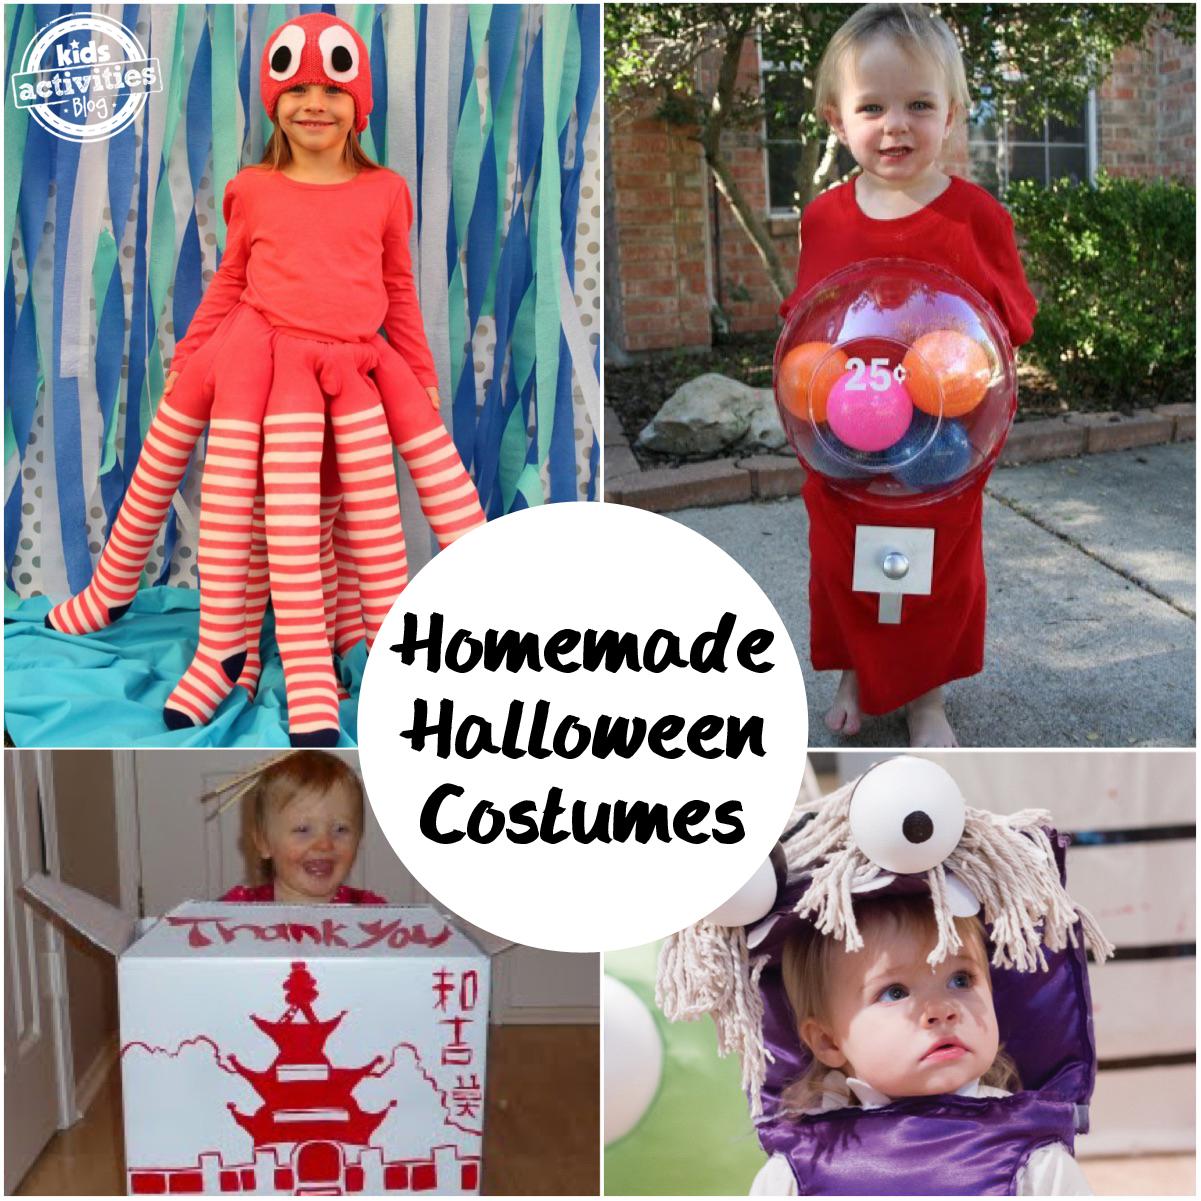 Homemade Halloween Costume.Homemade Halloween Costumes